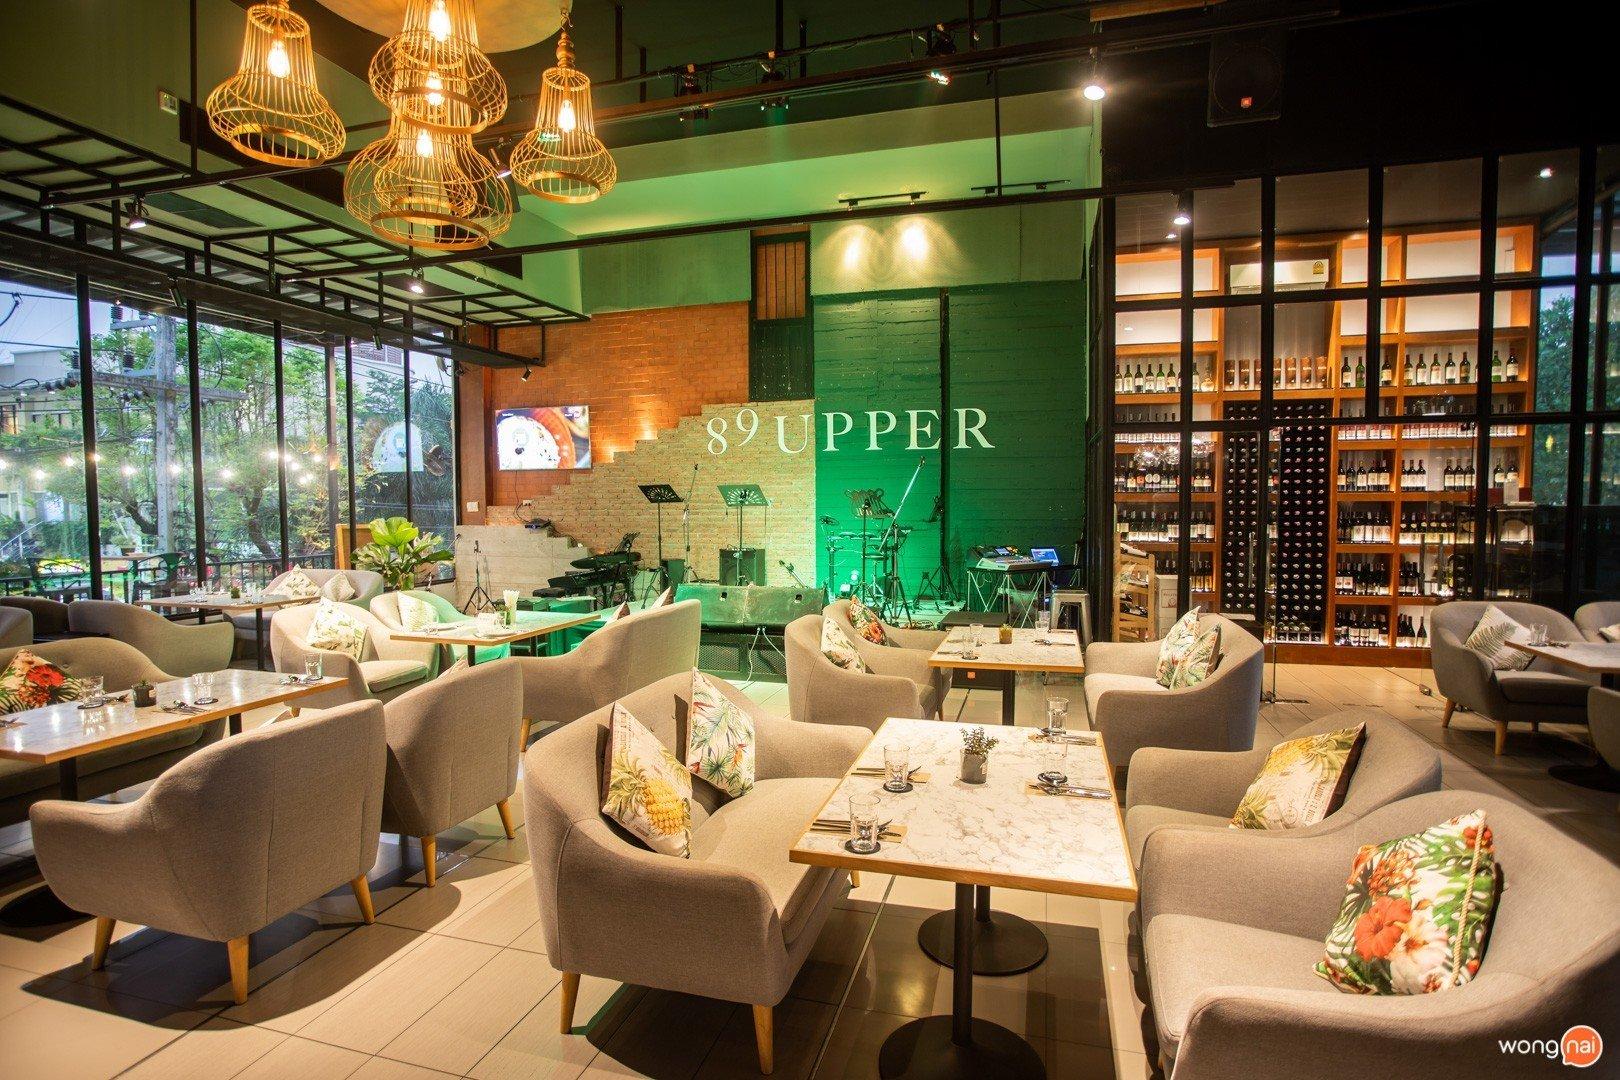 89 Upper Bar ร้านนั่งชิลล์ อุดรธานี บรรยากาศดี ดนตรีโดน - Wongnai